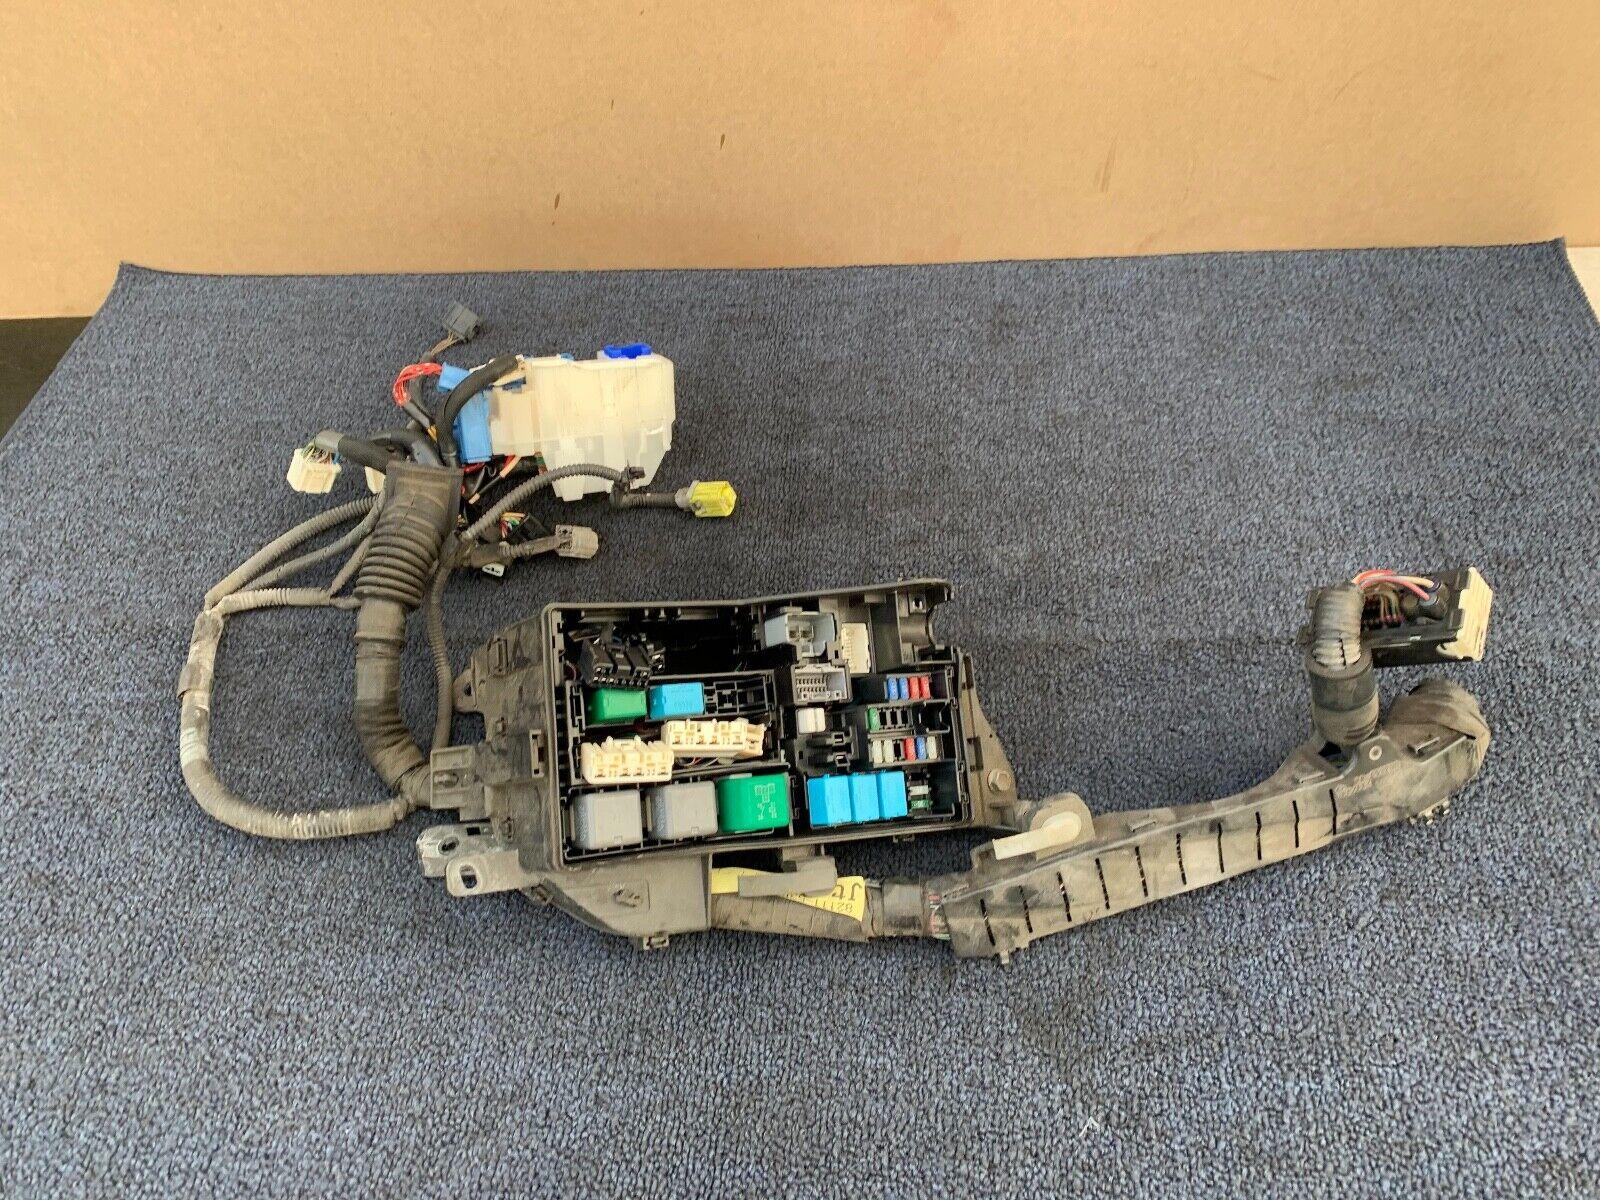 [SCHEMATICS_48IS]  ✓LEXUS IS-F ISF ENGINE FUSE BOX SAM RELAY MODULE HARNESS WIRE BATTERY FUSE  OEM | eBay | Lexus Isf Fuse Box |  | eBay